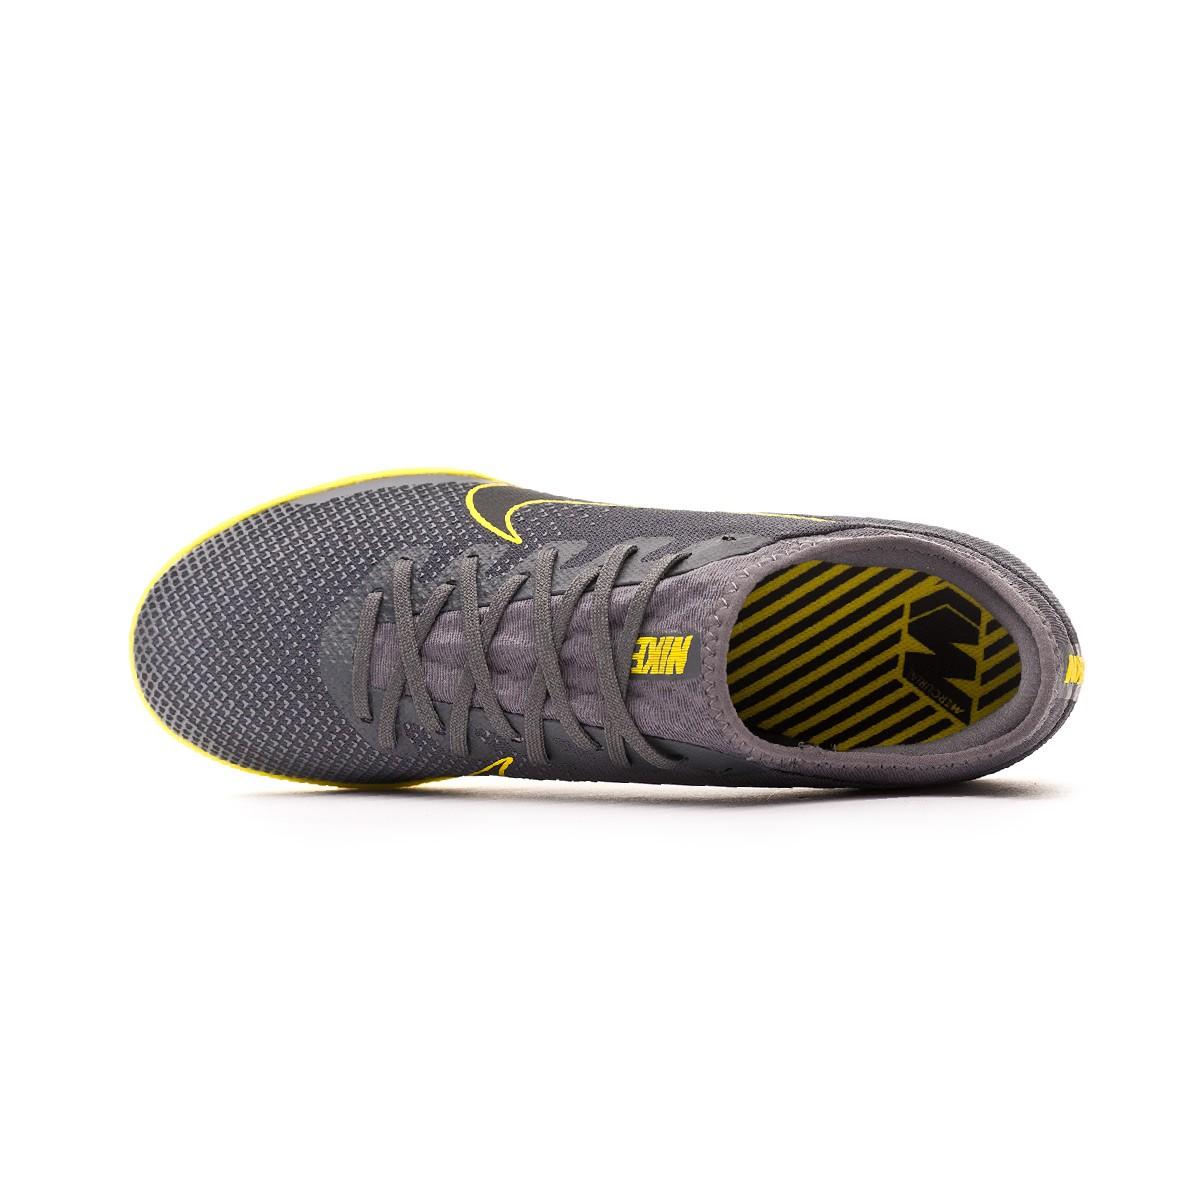 músico En general Aniquilar  Football Boot Nike Mercurial VaporX XII Pro Turf Anthracite-Optical  yellow-Dark grey-Black - Football store Fútbol Emotion